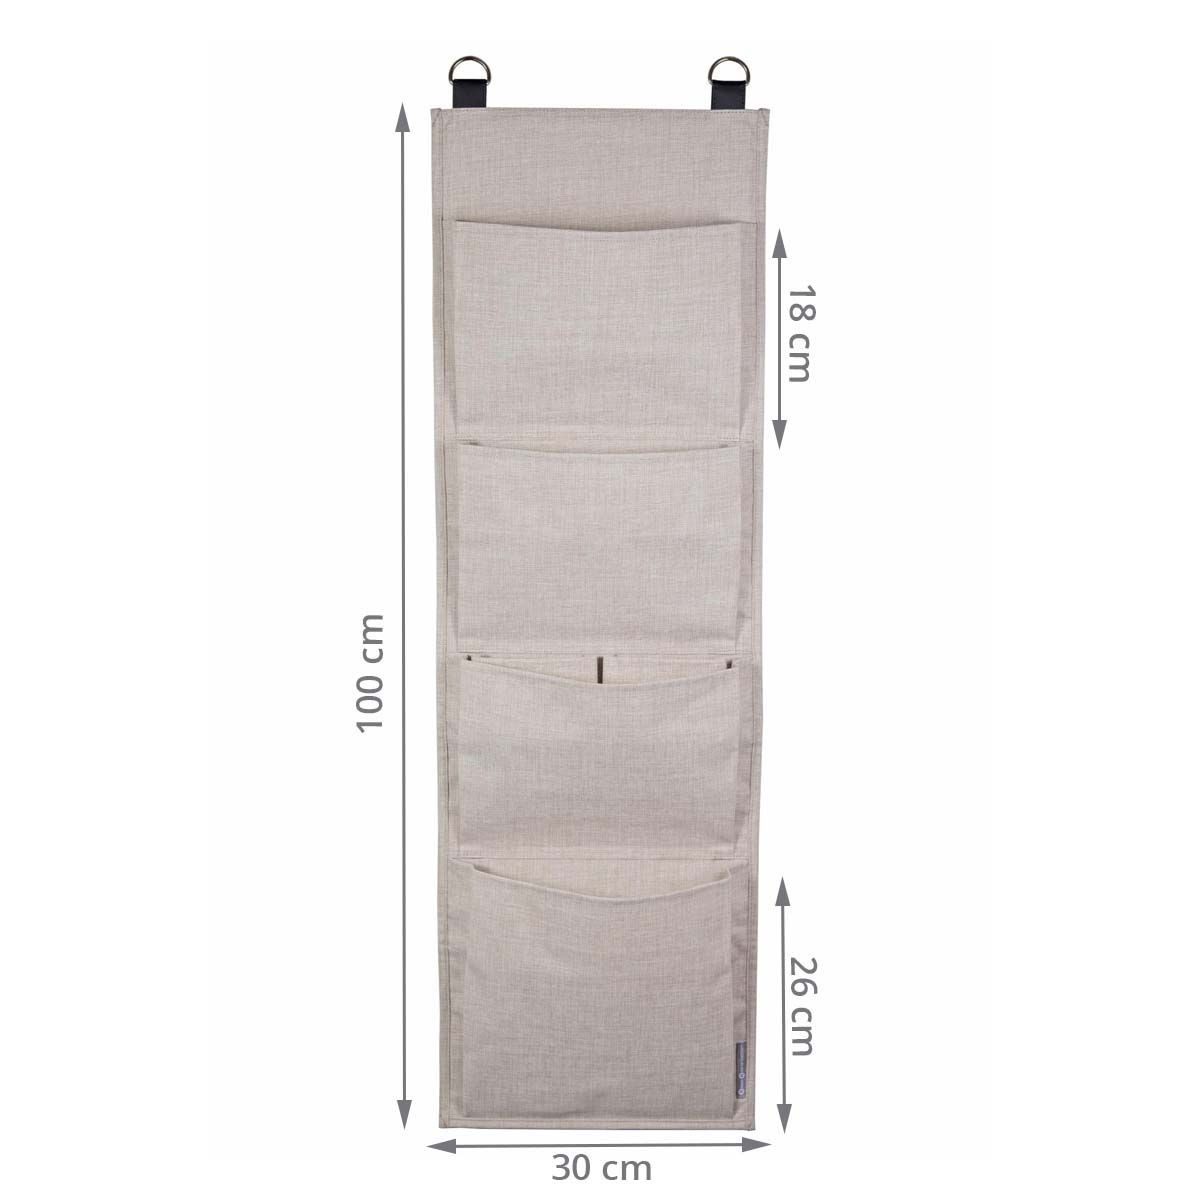 Rangement mural en tissu - 4 grandes poches - À suspendre